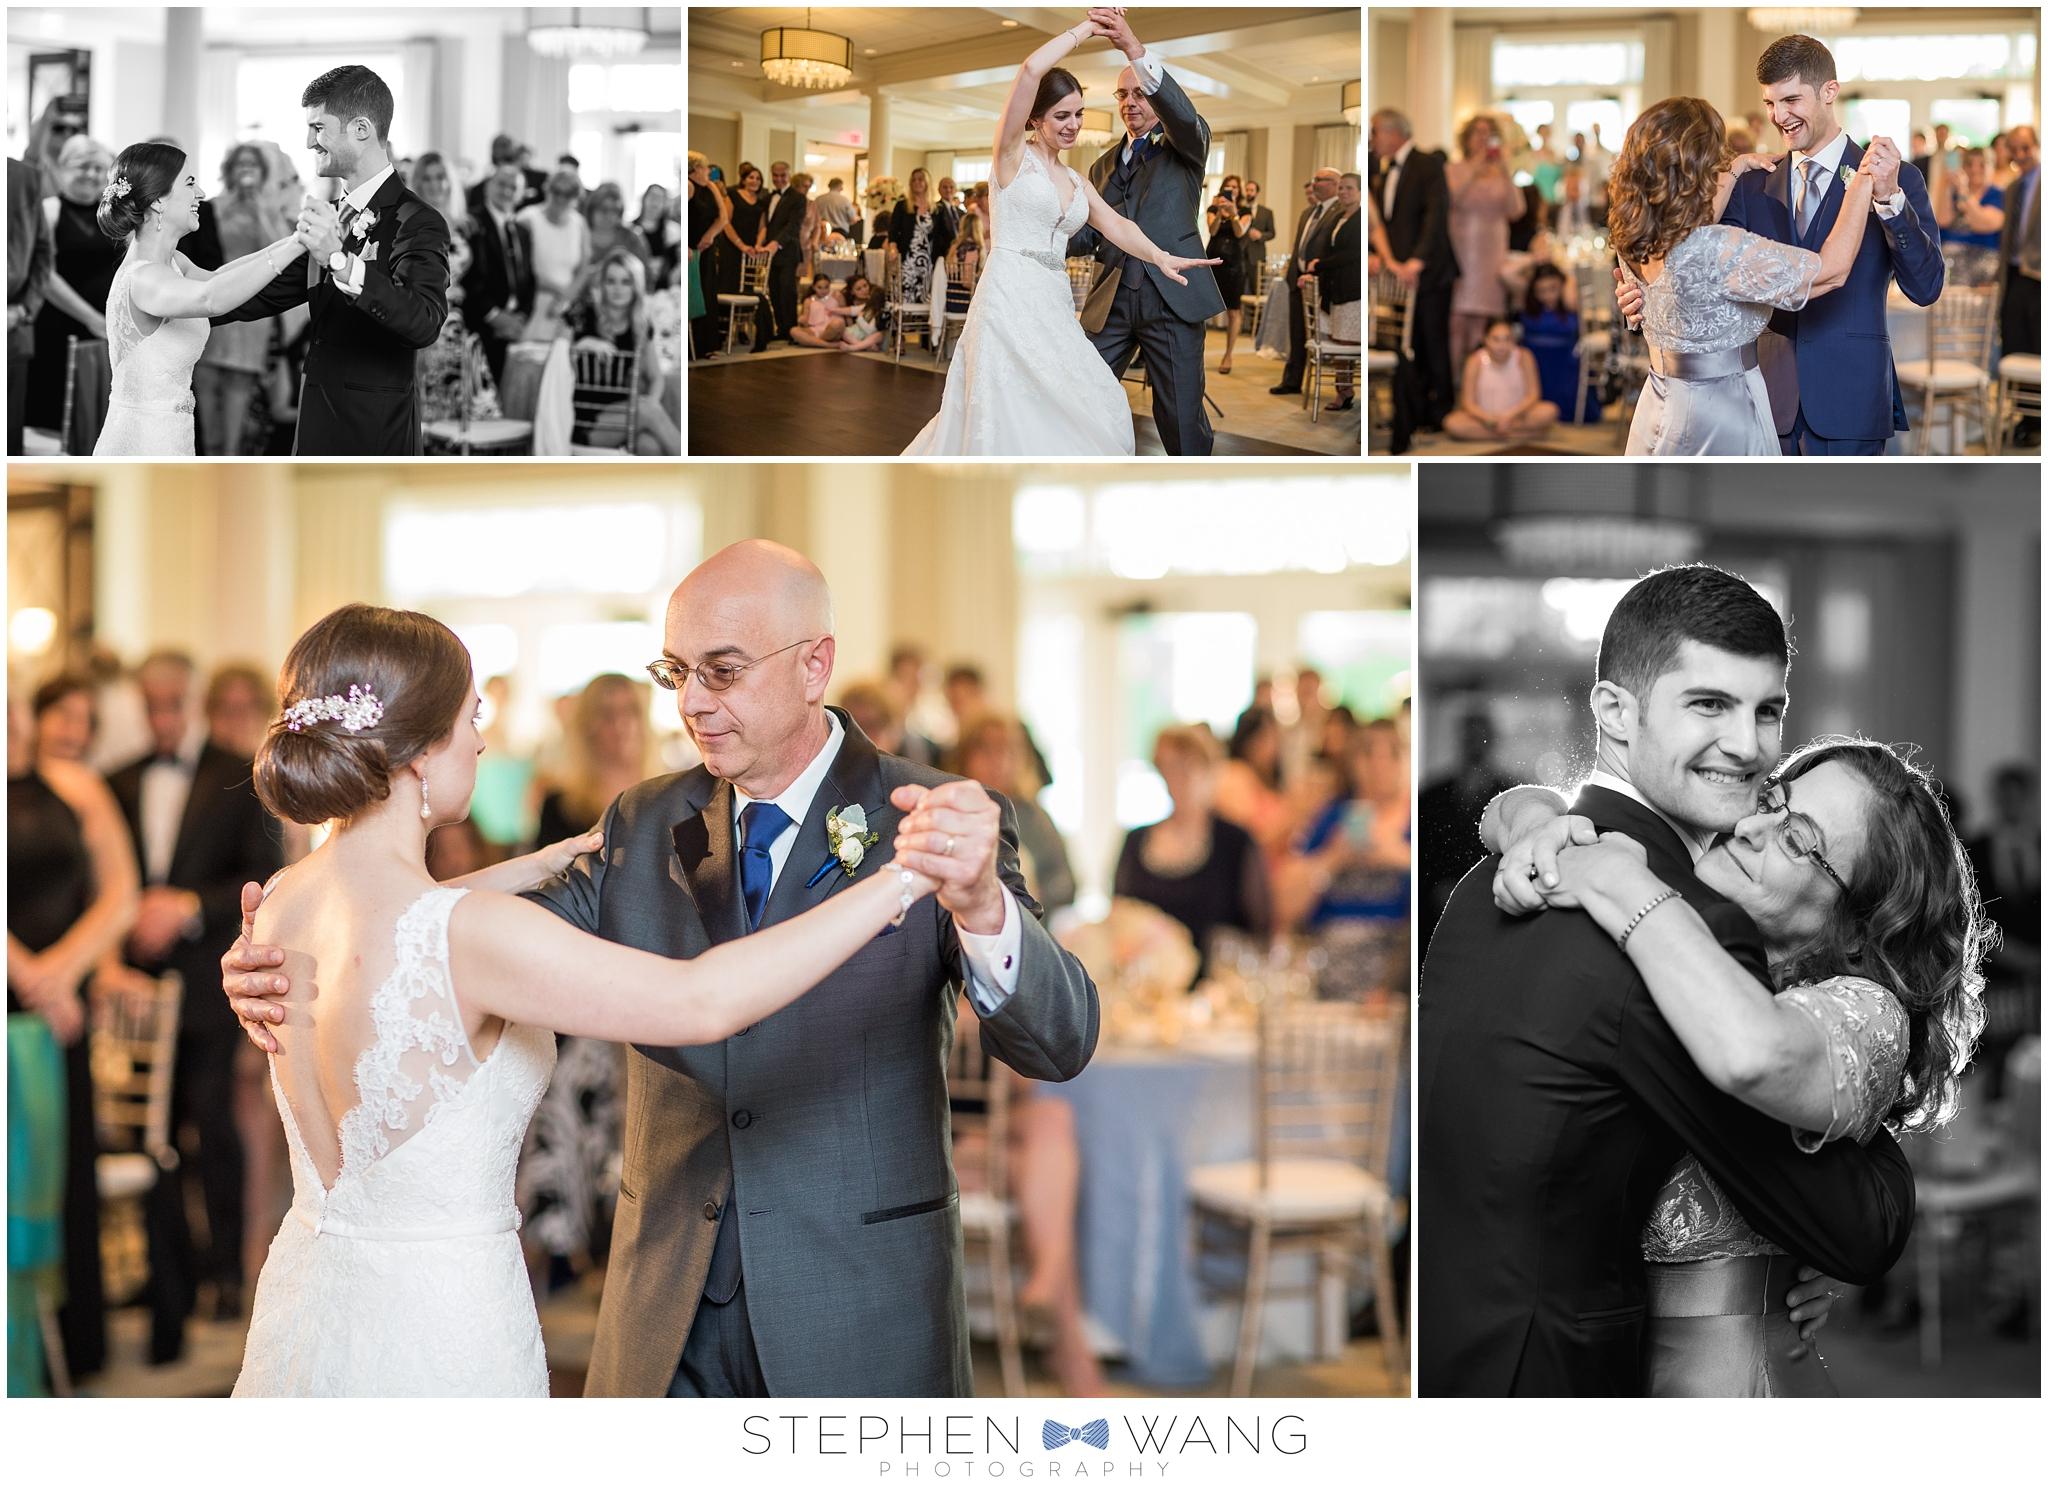 Stephen Wang Photography Shorehaven Norwalk CT Wedding Photographer connecticut shoreline shore haven - 32.jpg